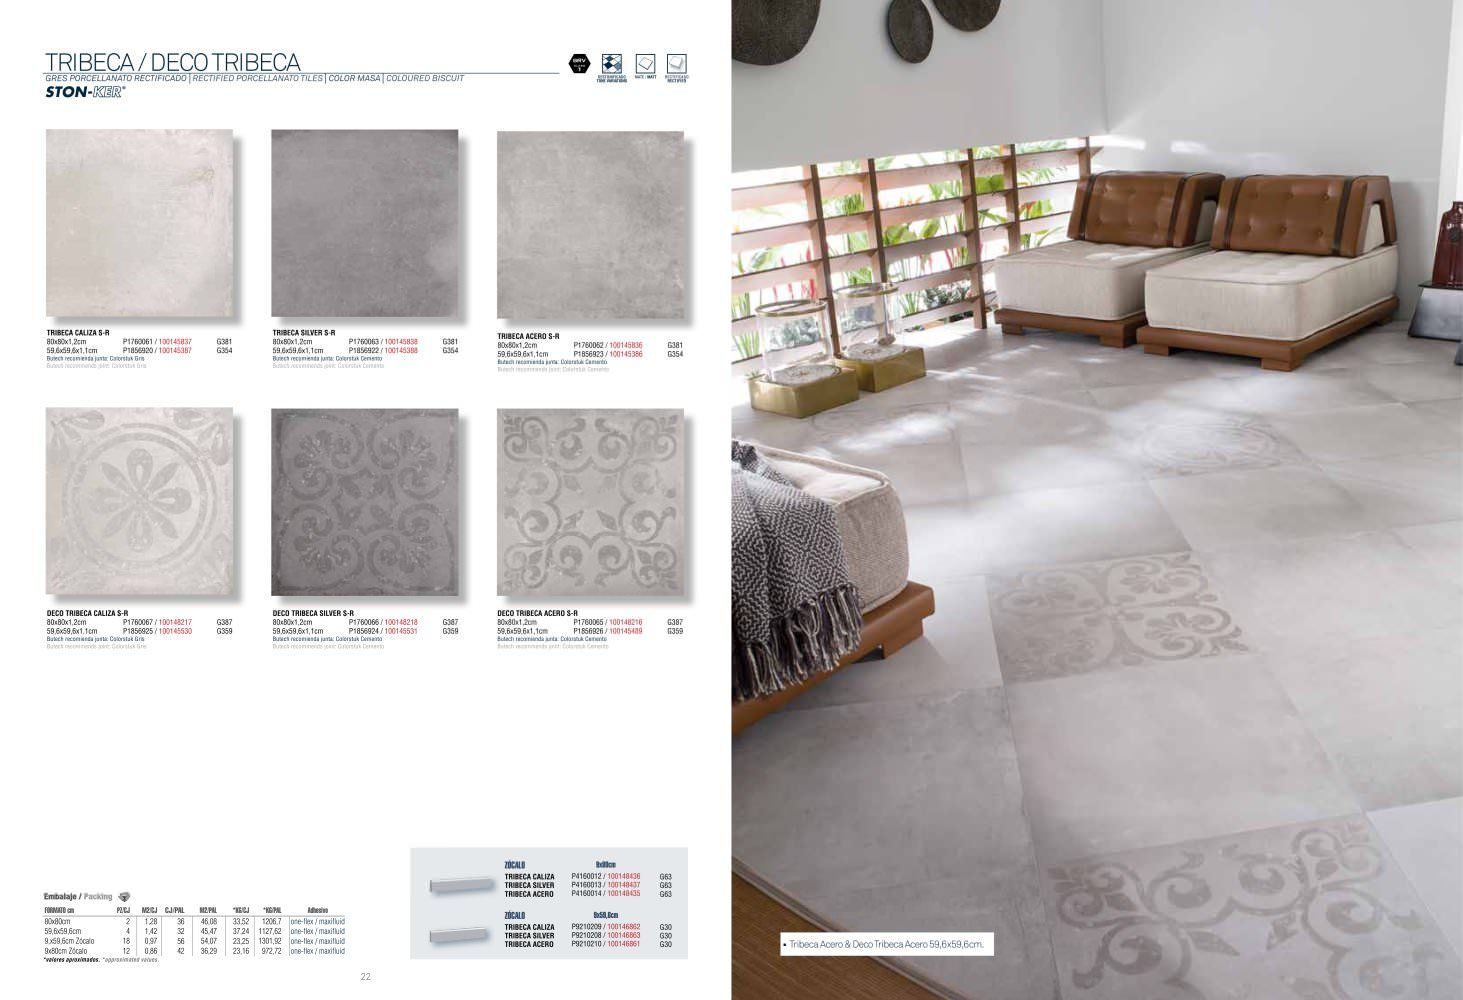 Deco tribeca silver google search tile pinterest for Fliesenboden renovieren